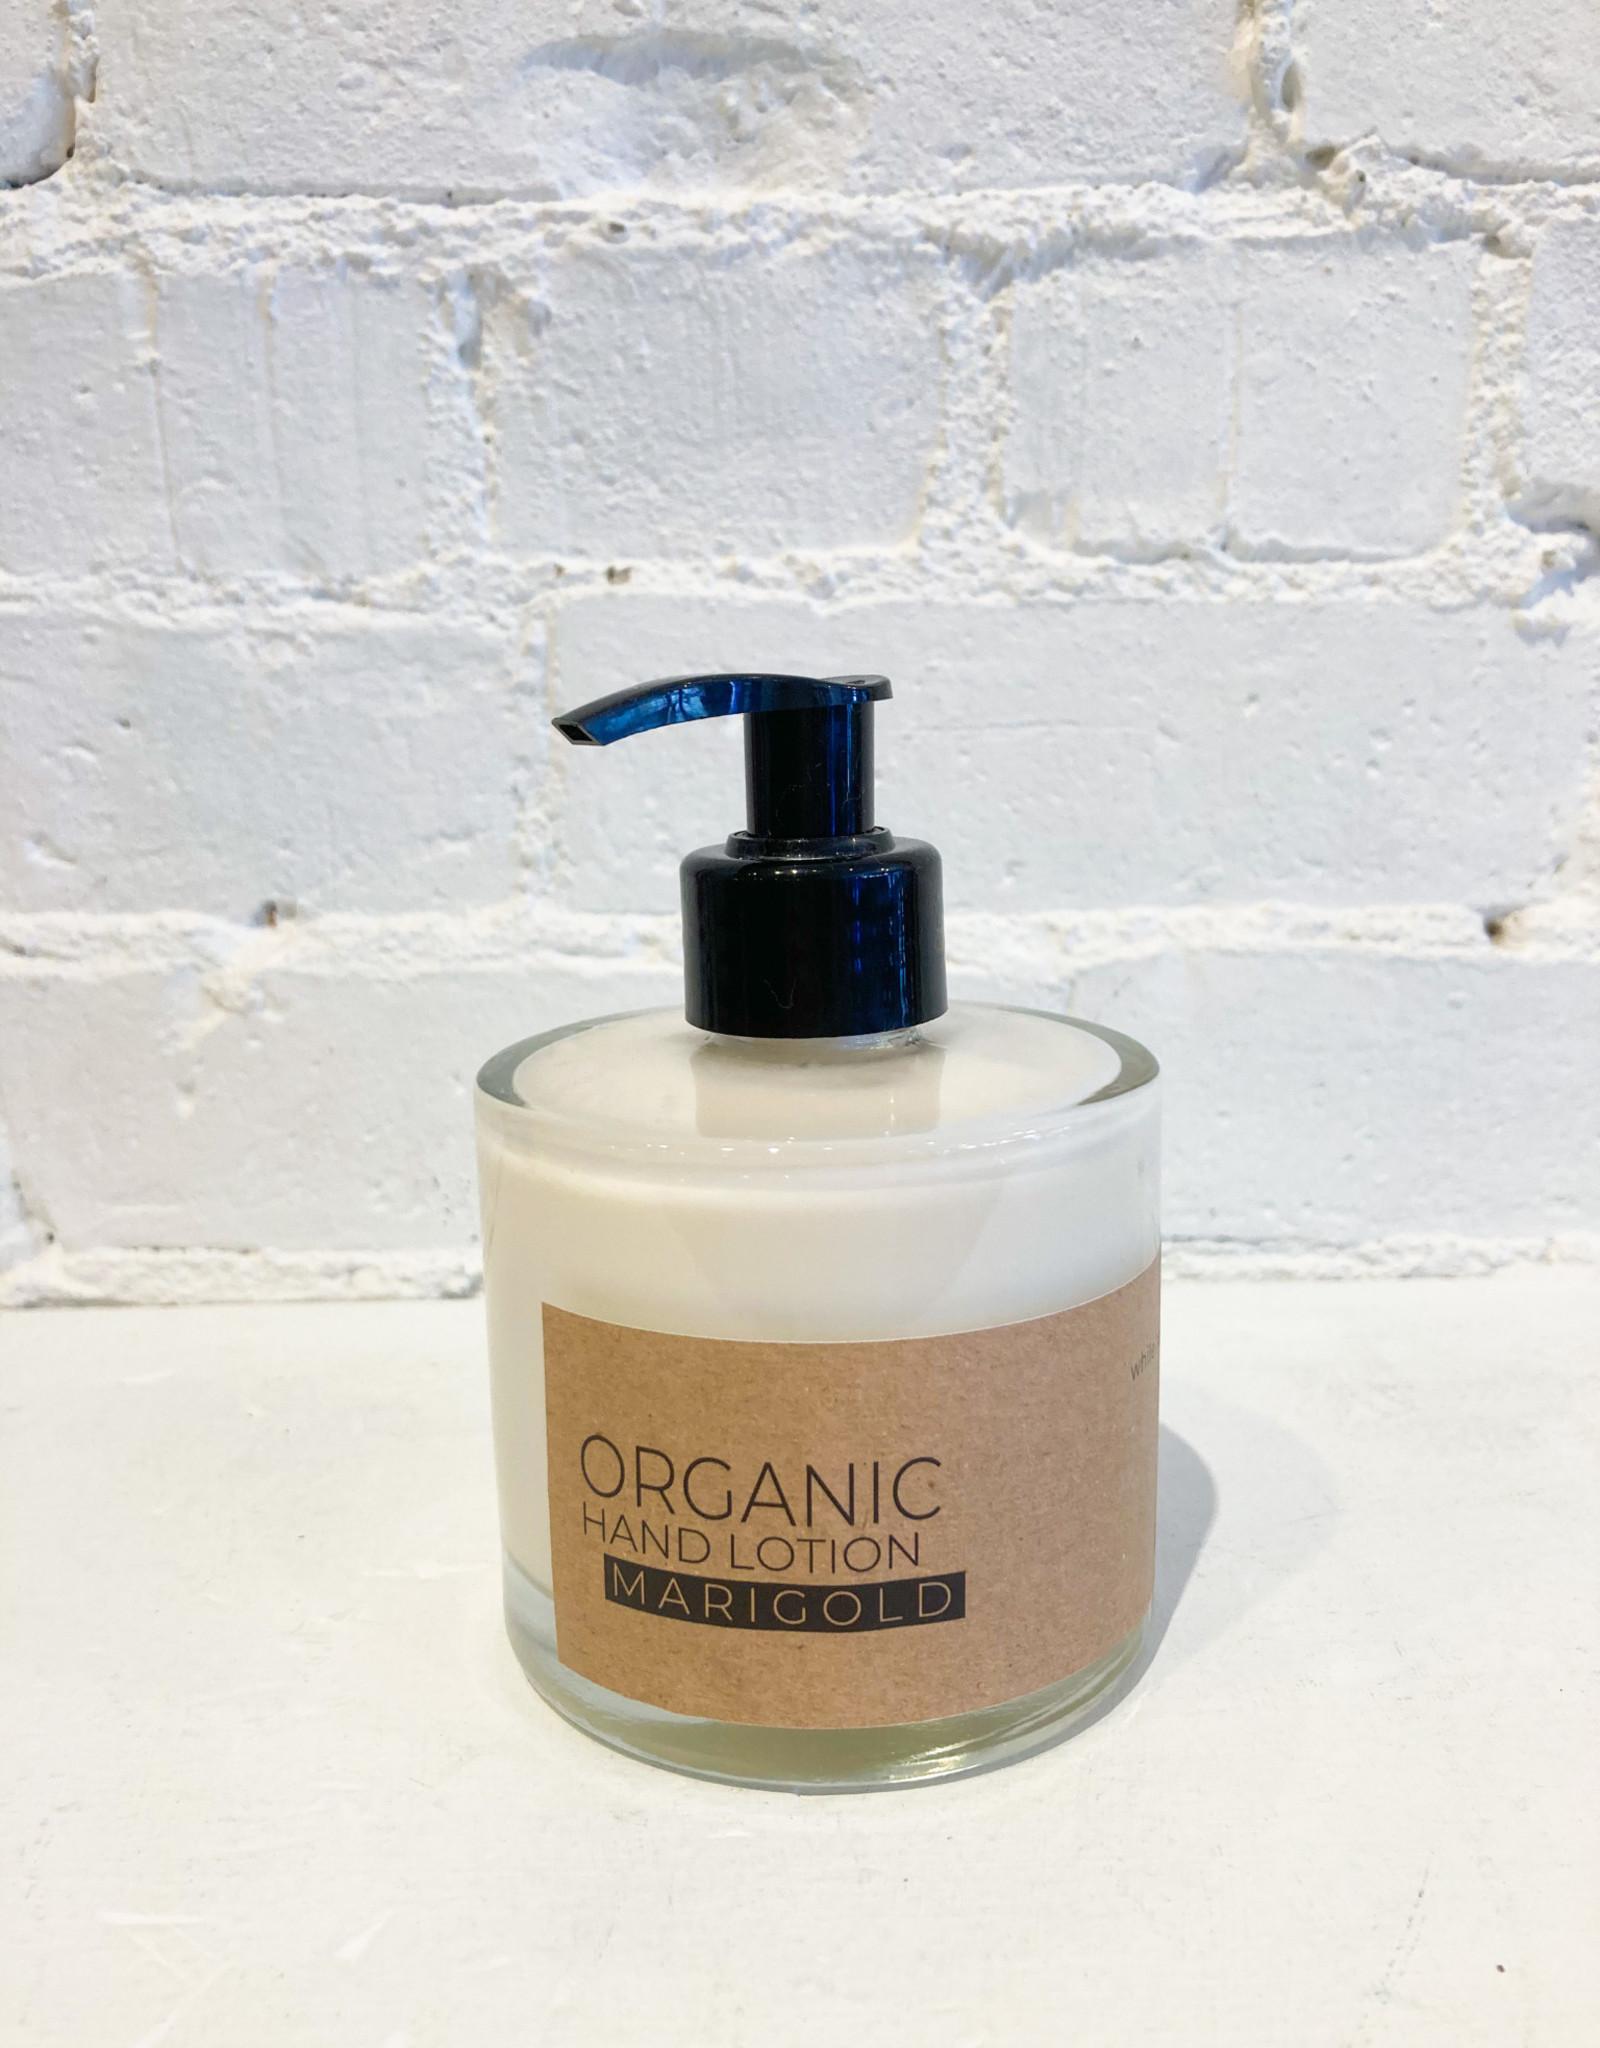 The Munio Organic Hand Lotion- Marigold